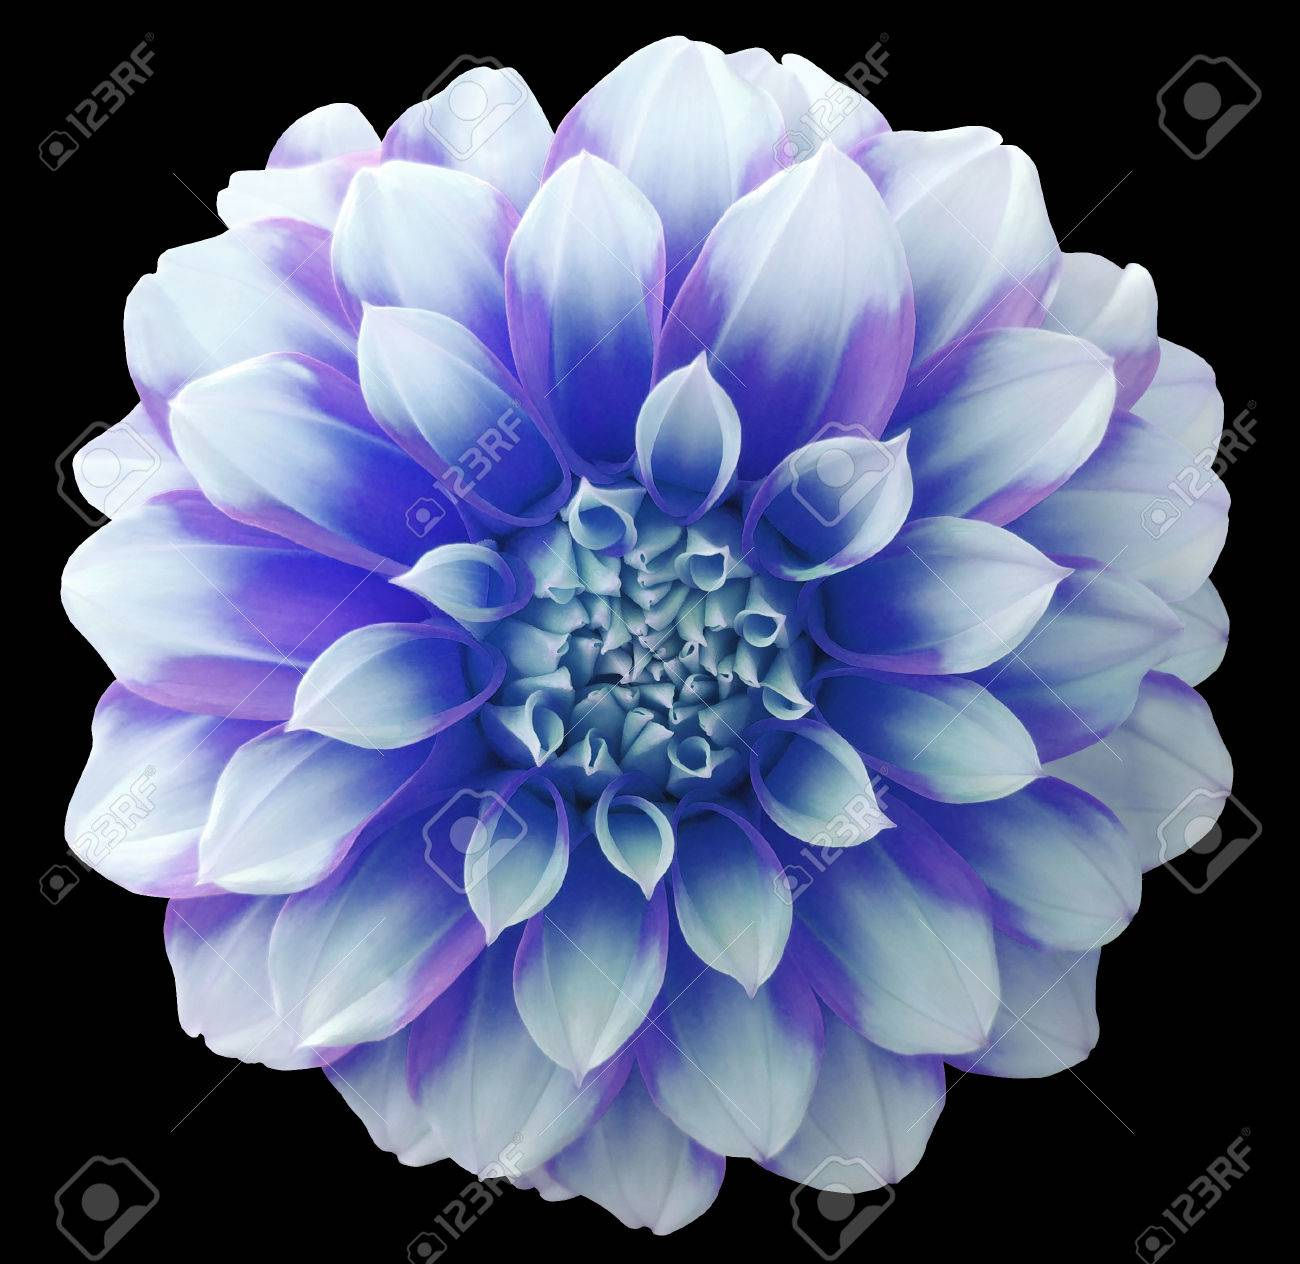 Dahlia blue white flower variegated flower black background dahlia blue white flower variegated flower black background isolated with clipping path closeup mightylinksfo